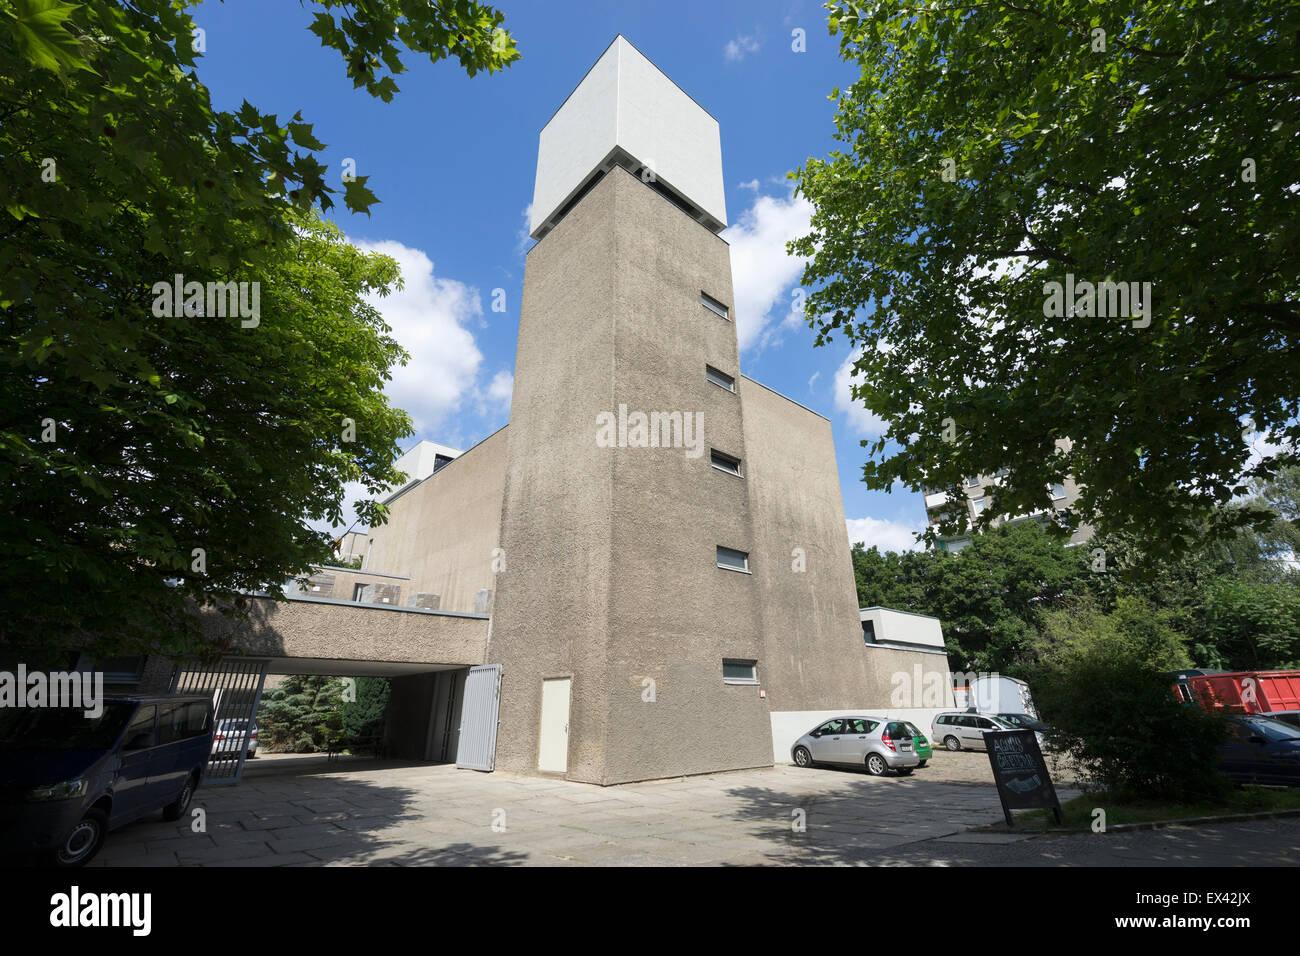 St Agnes church art space and community centre in Kreuzberg  Berlin Germany - Stock Image